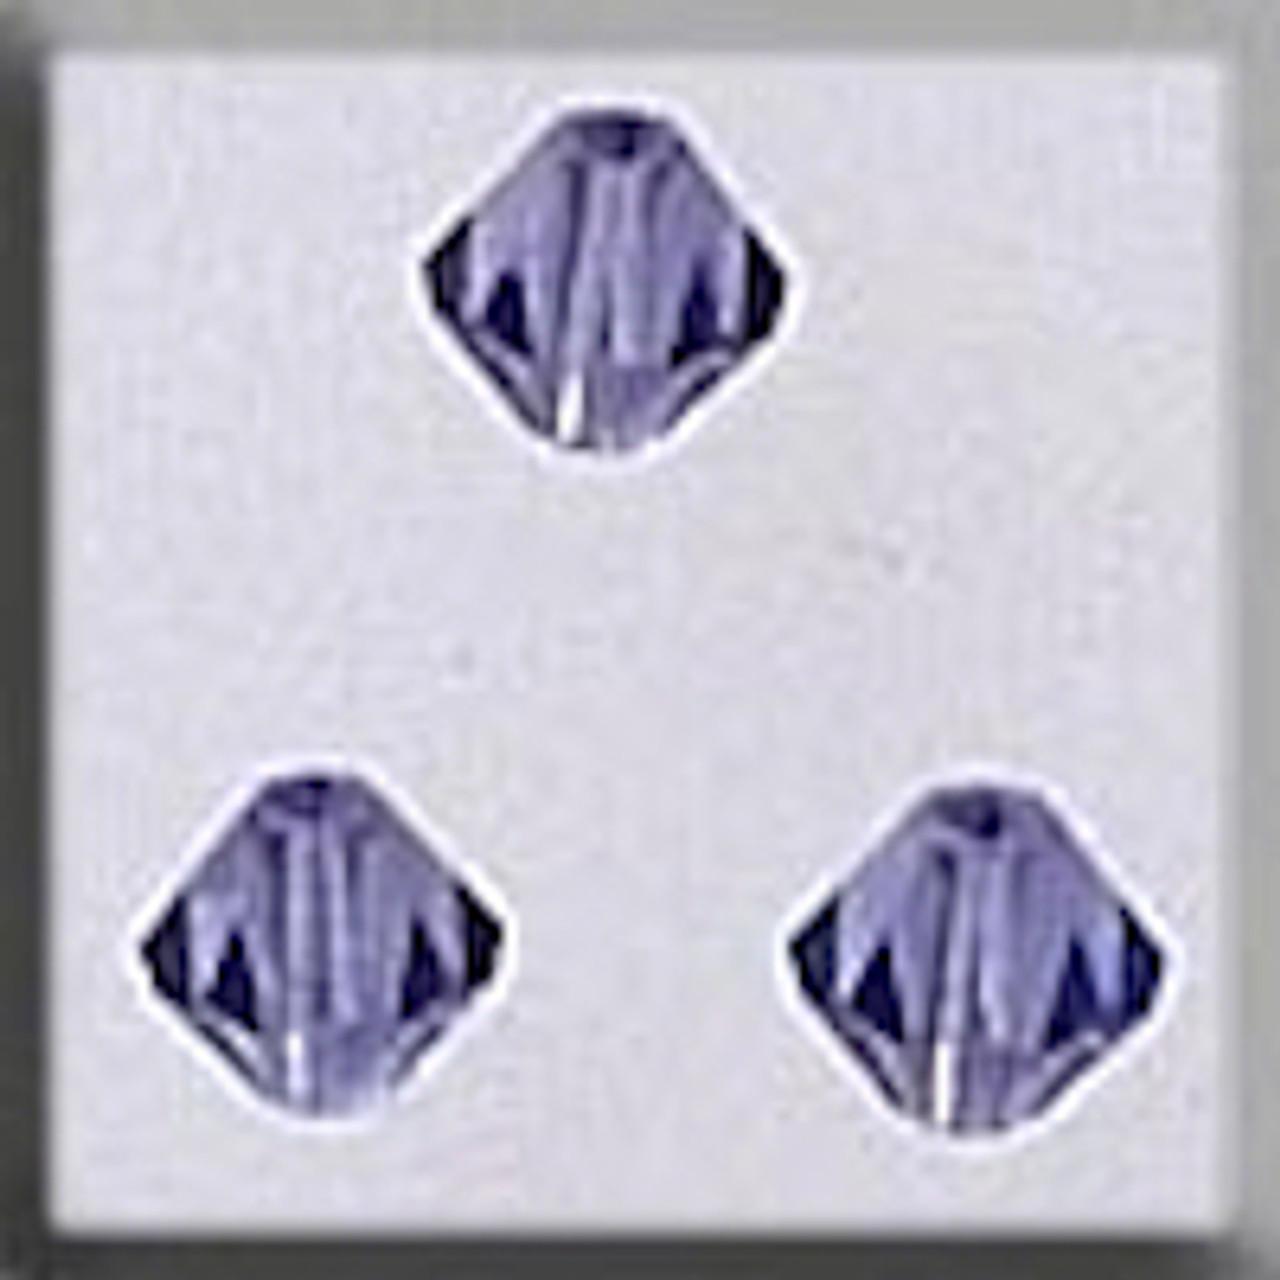 Mill Hill Crystal Treasures - Rondele Tanazanite AB #13080